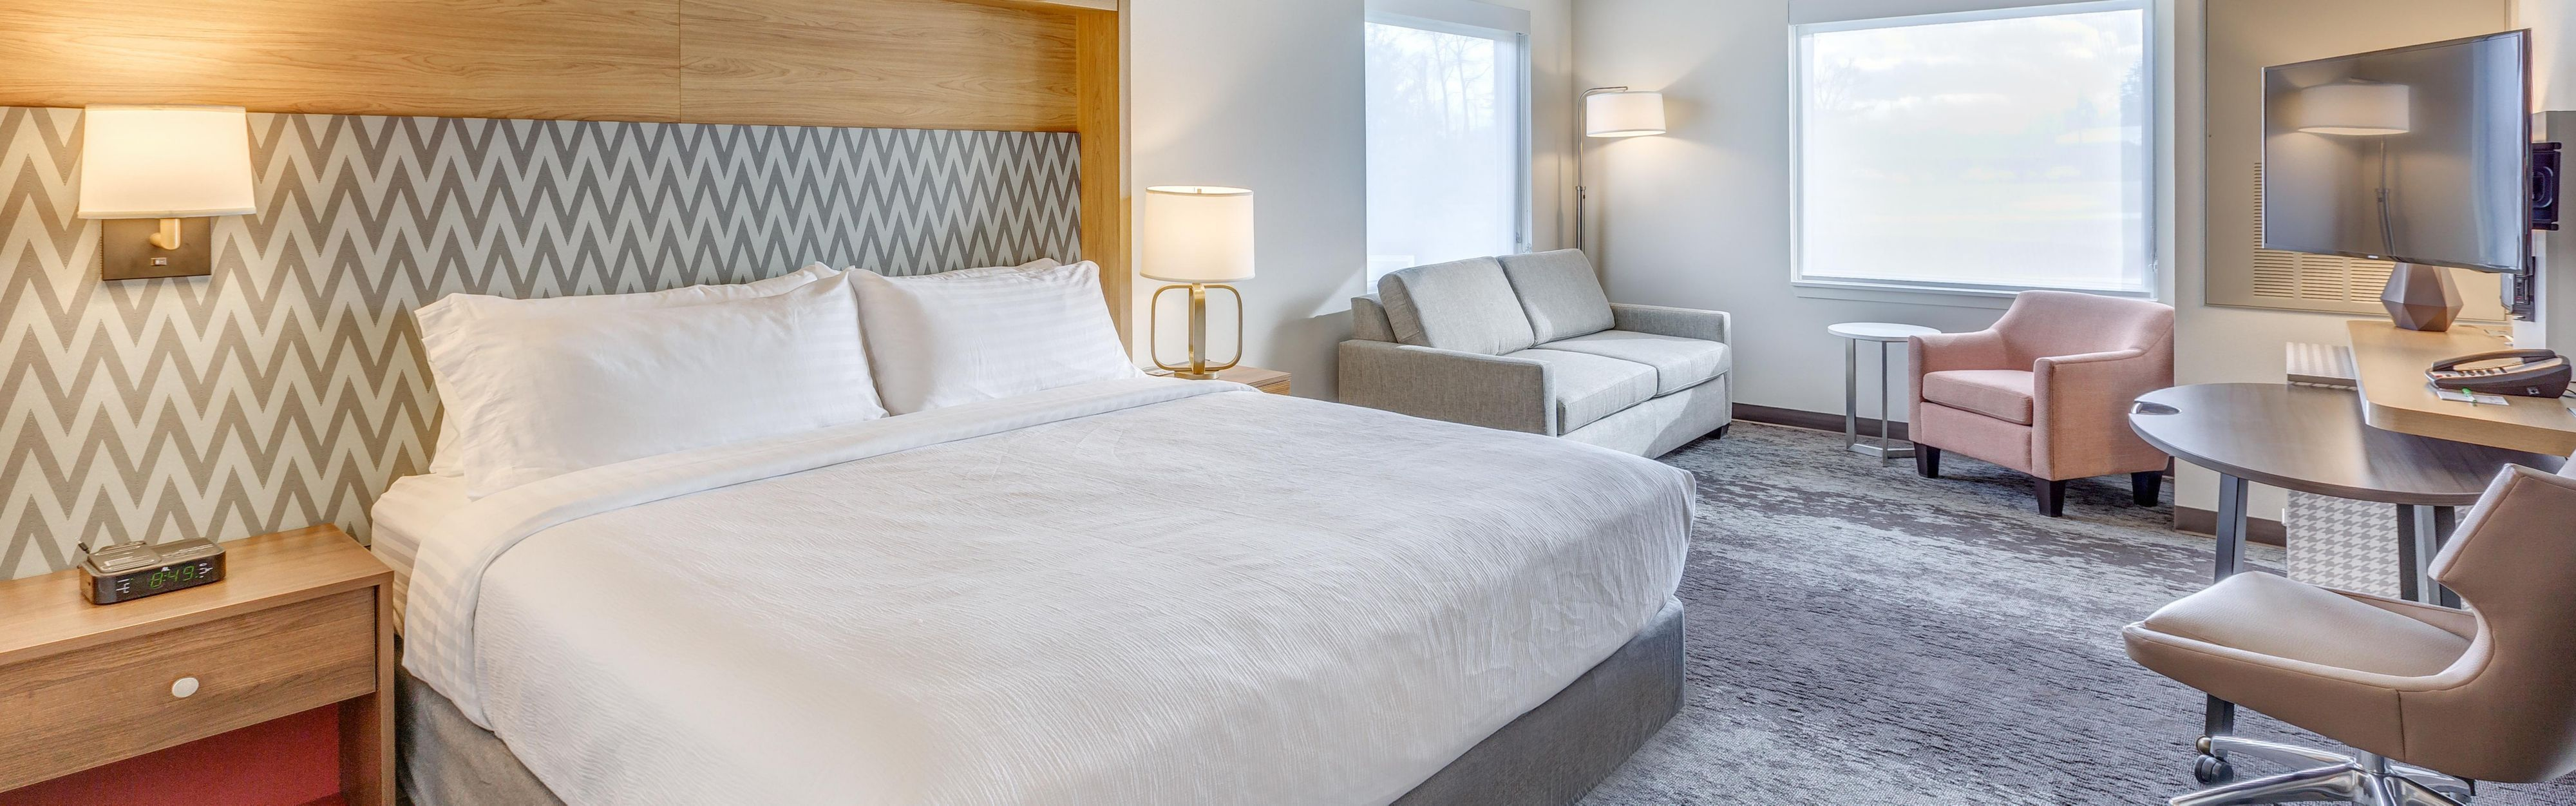 Holiday Inn & Suites Bellingham image 1